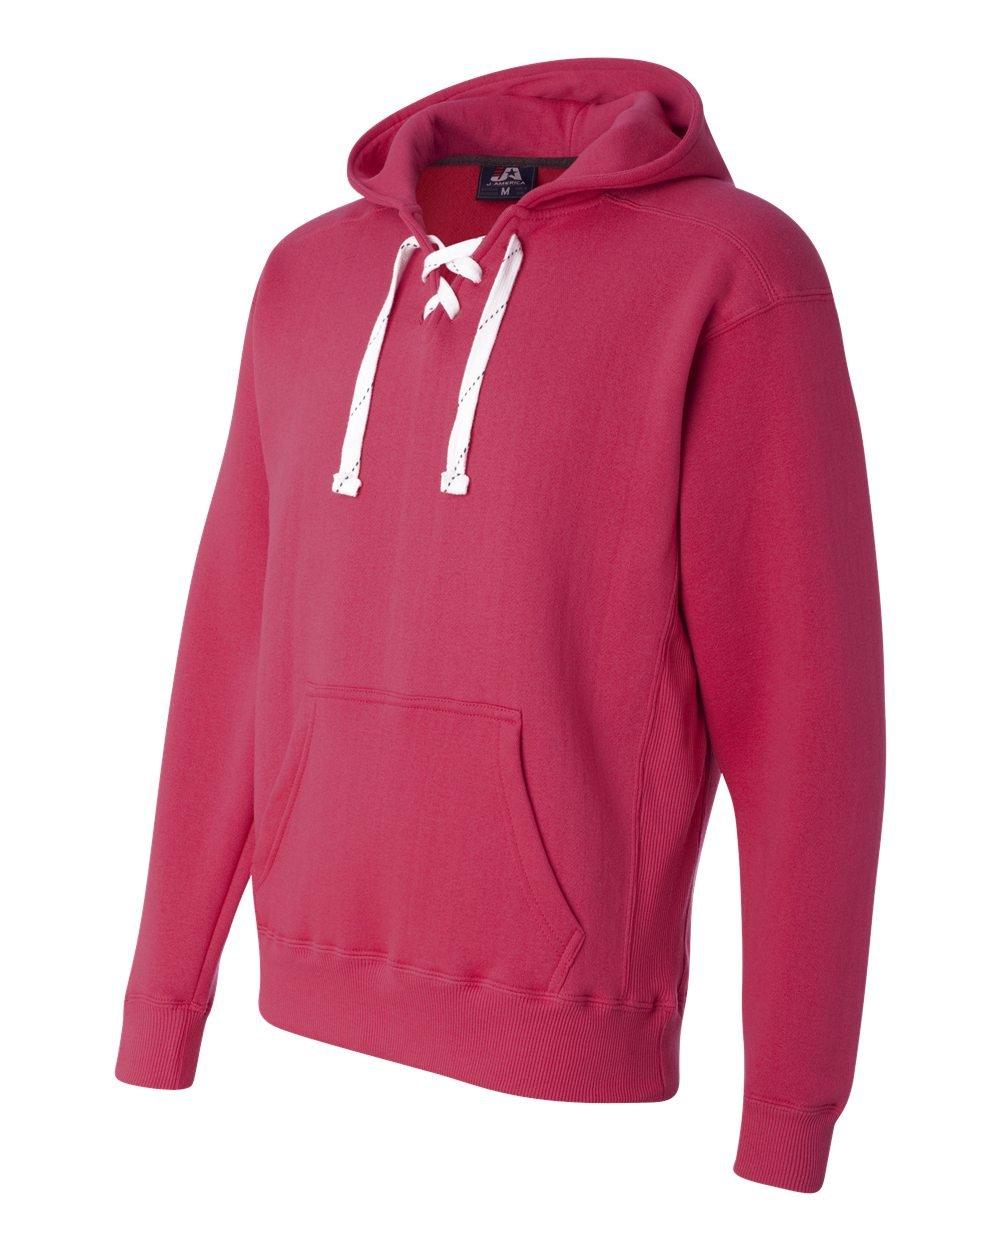 Wildberry Hockey Hood Sweatshirt: 80% Ringspun Cotton, 20% Polyester Fleece Fabric.,Wildberry Pink,Small